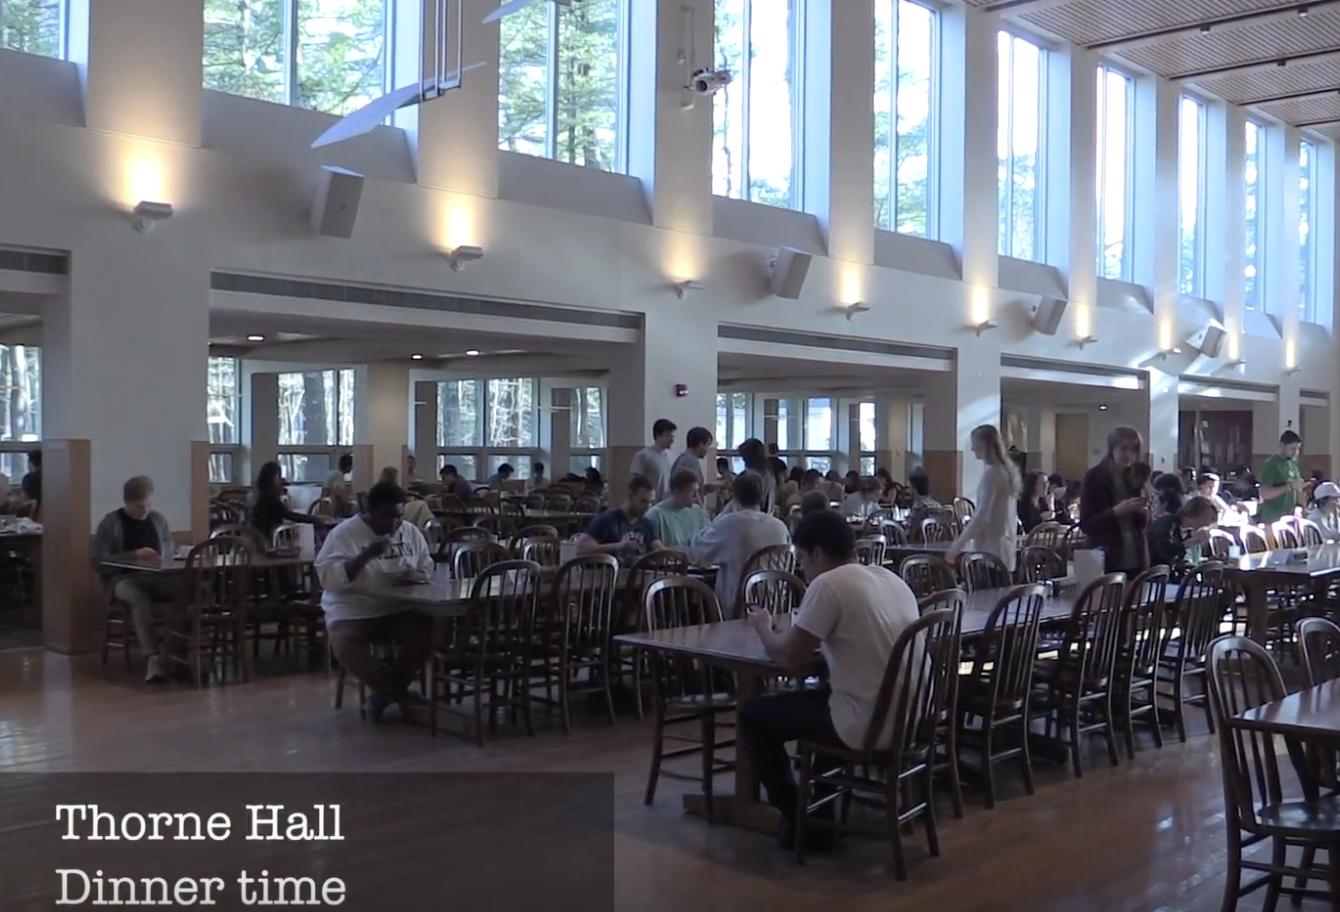 Thorne dining hall